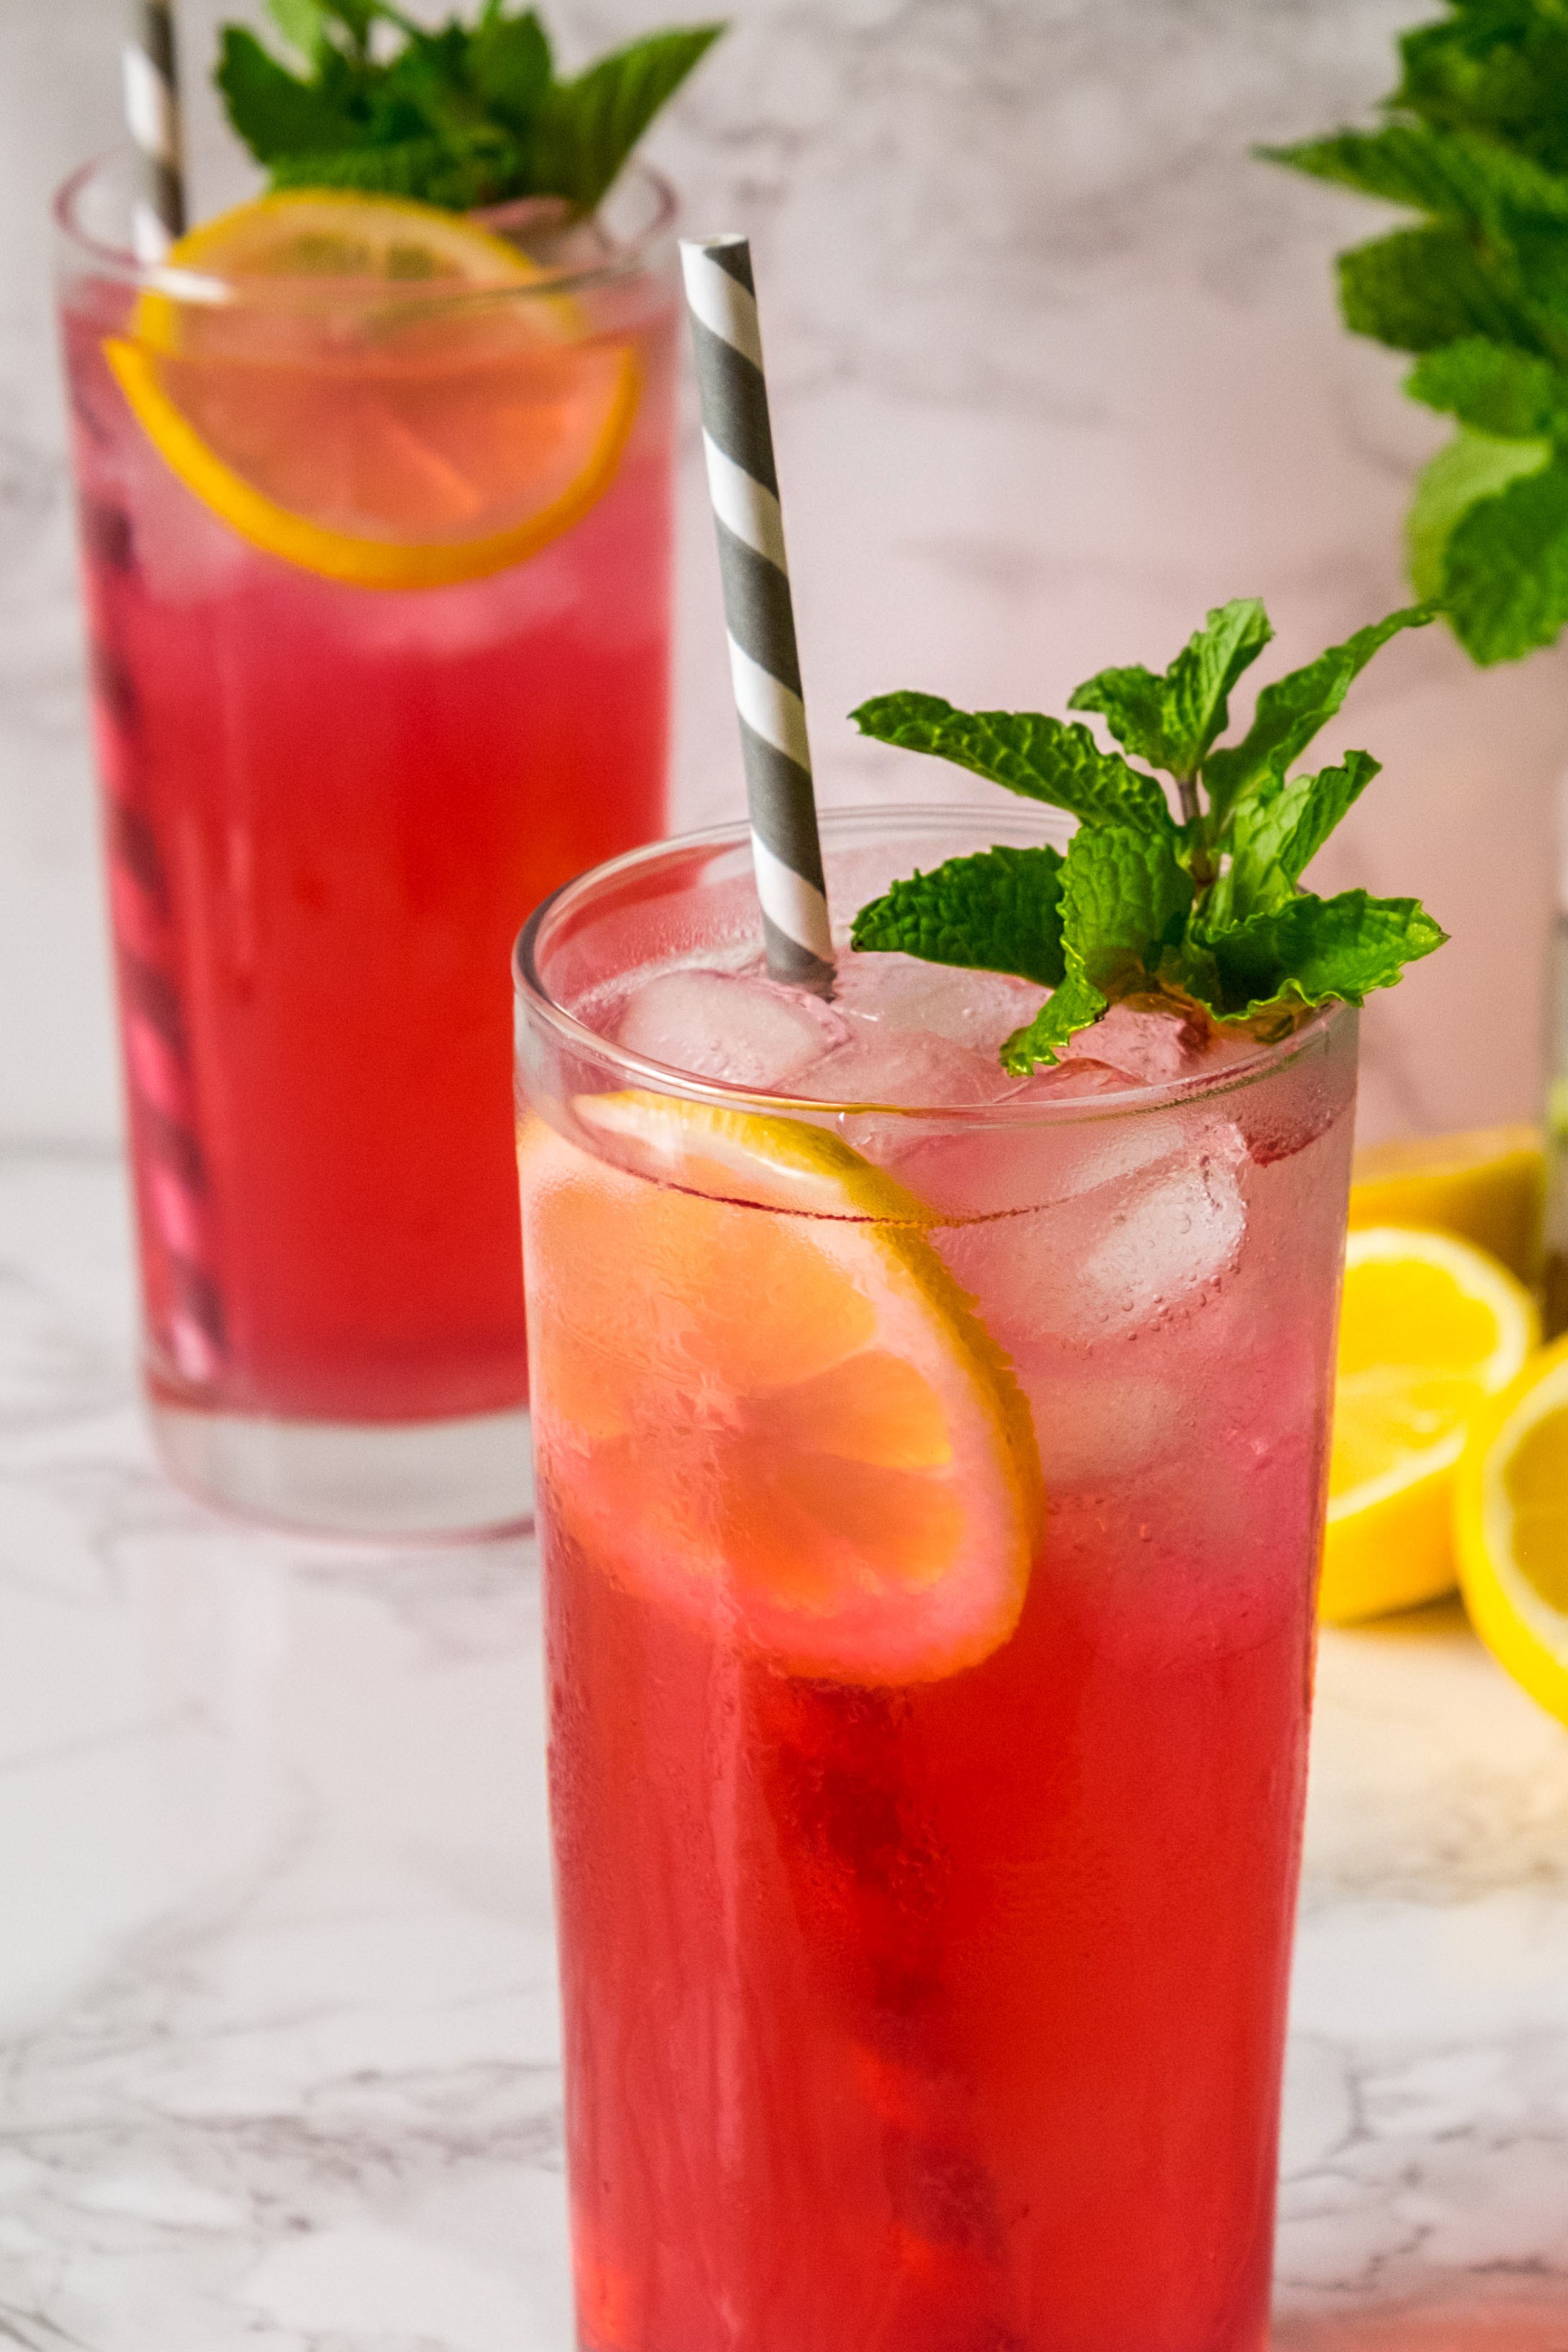 Blueberry infused vodka pink lemonade